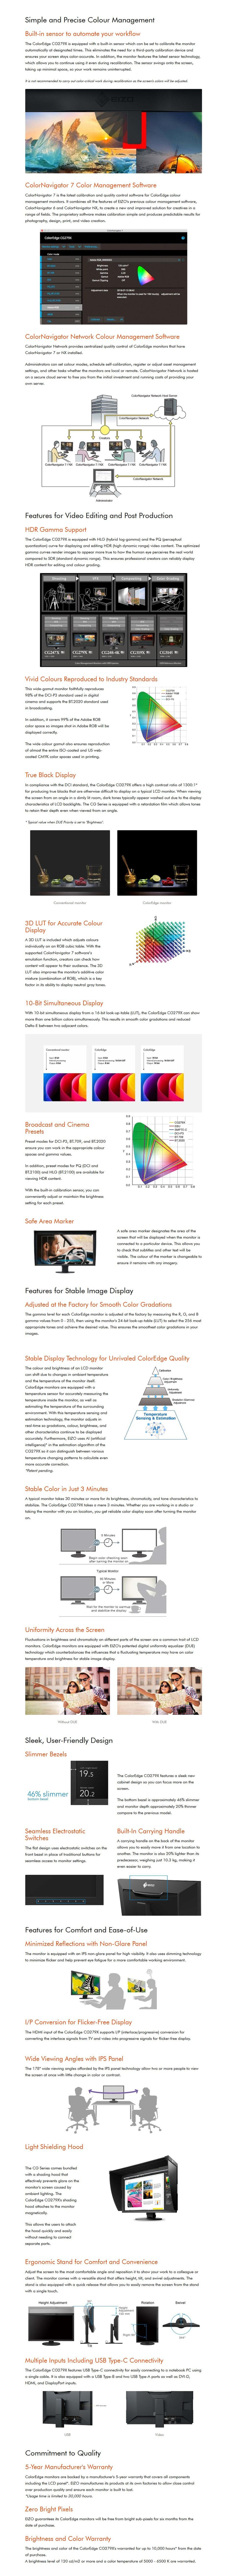 "Eizo ColorEdge CG279X 27"" WQHD Professional Self-Calibrating IPS Monitor - Desktop Overview 1"